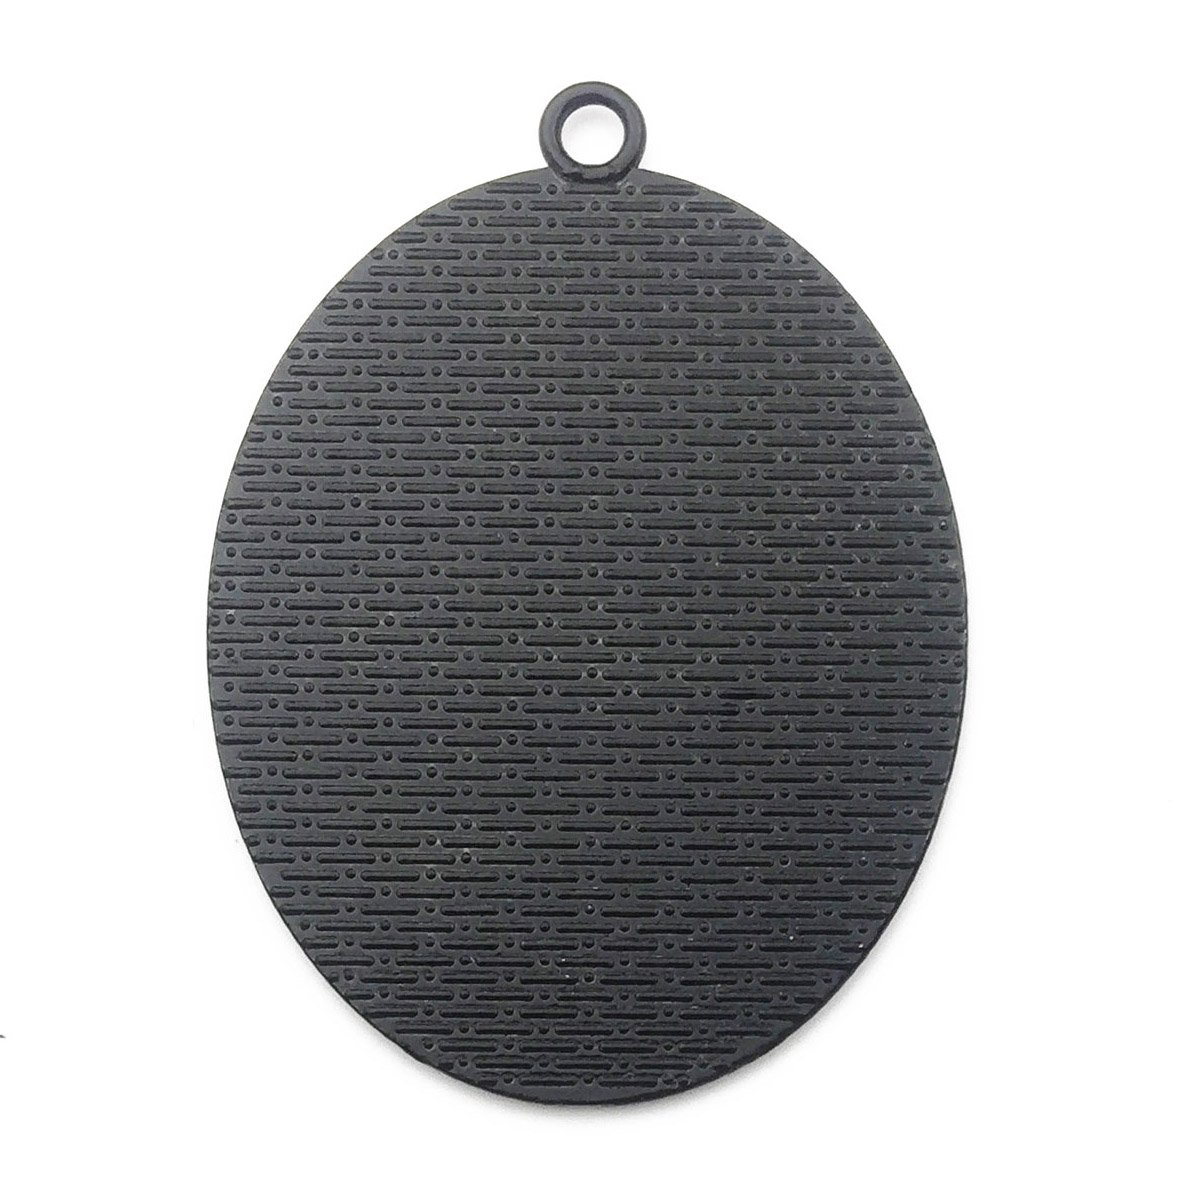 10pcs 30x40mm Black Oval Blank Bezel Pendant Trays Base Cabochon Settings Trays Pendant Blanks 10pcs Mixed No Duplicate